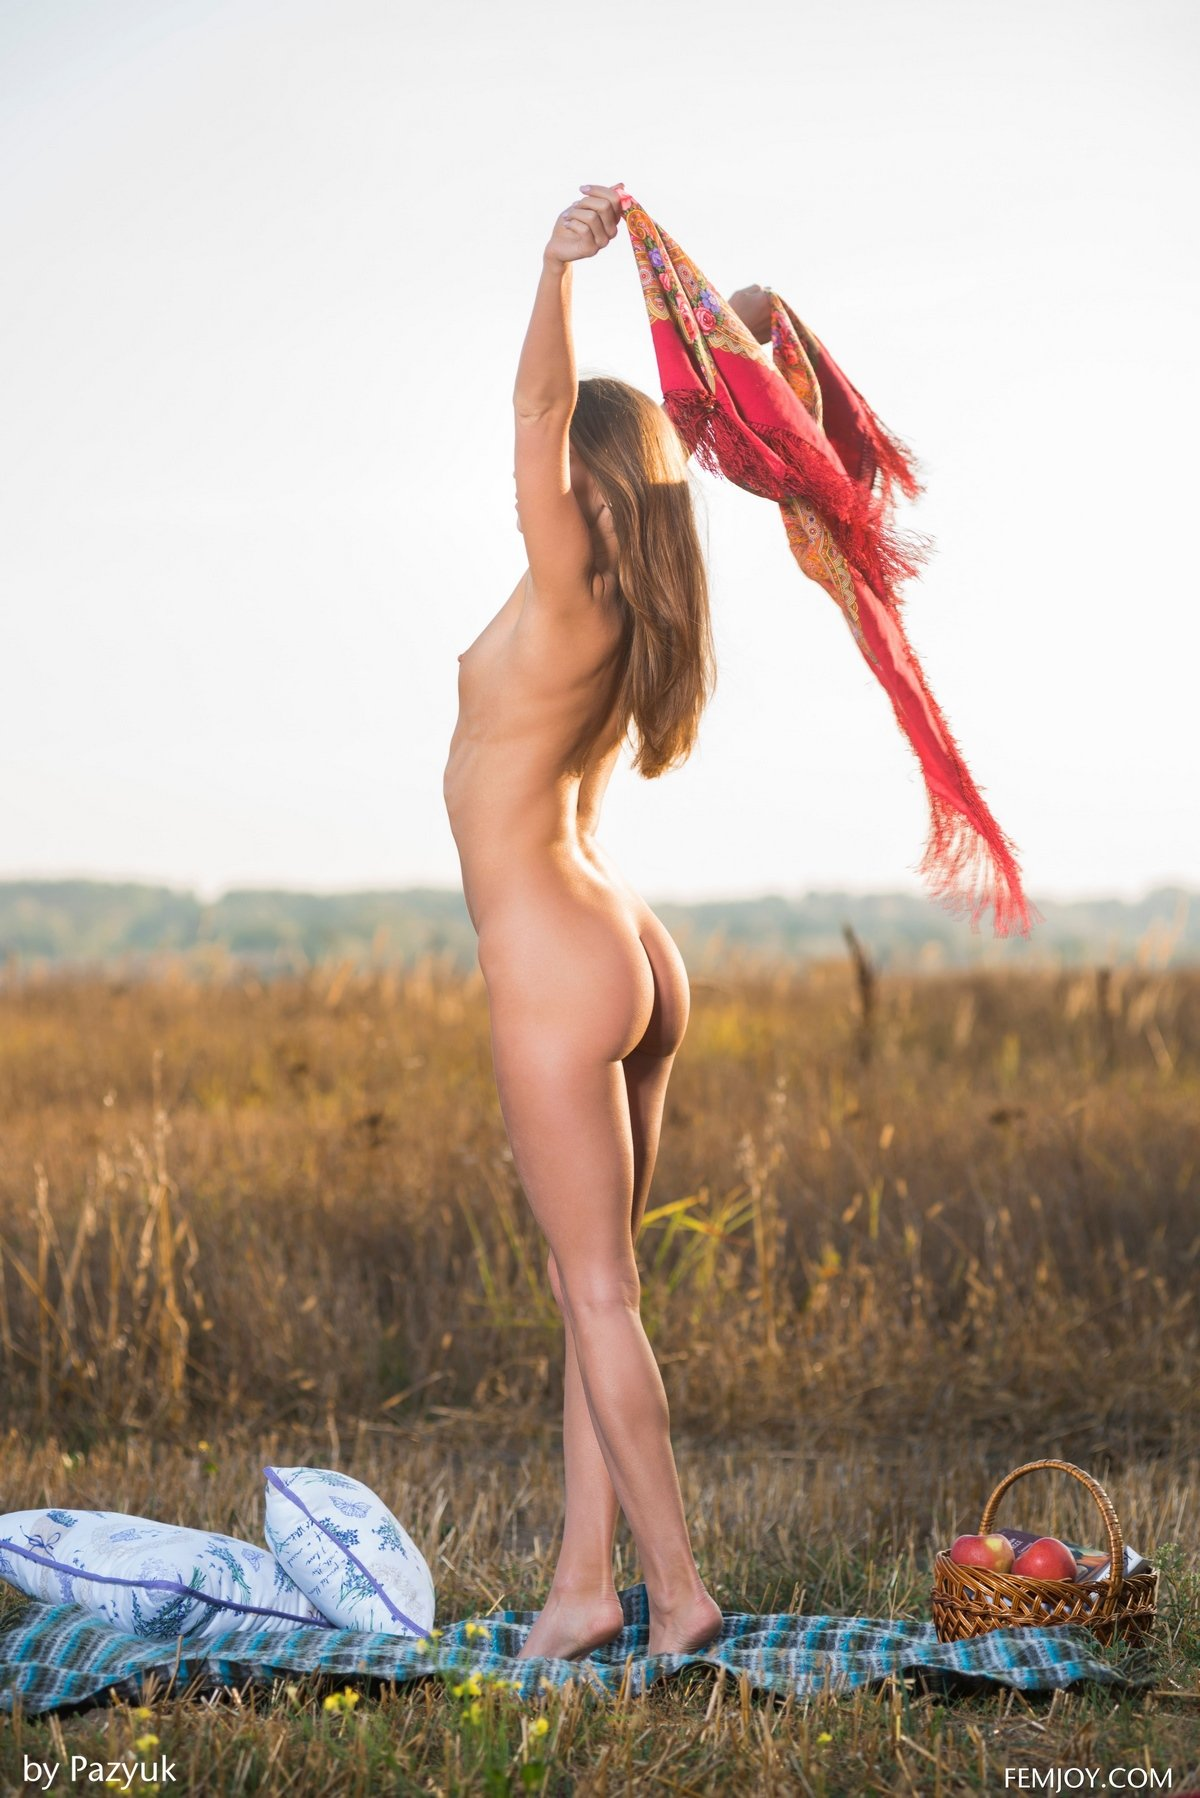 НЮ голой девушки с ярким платком на лугу